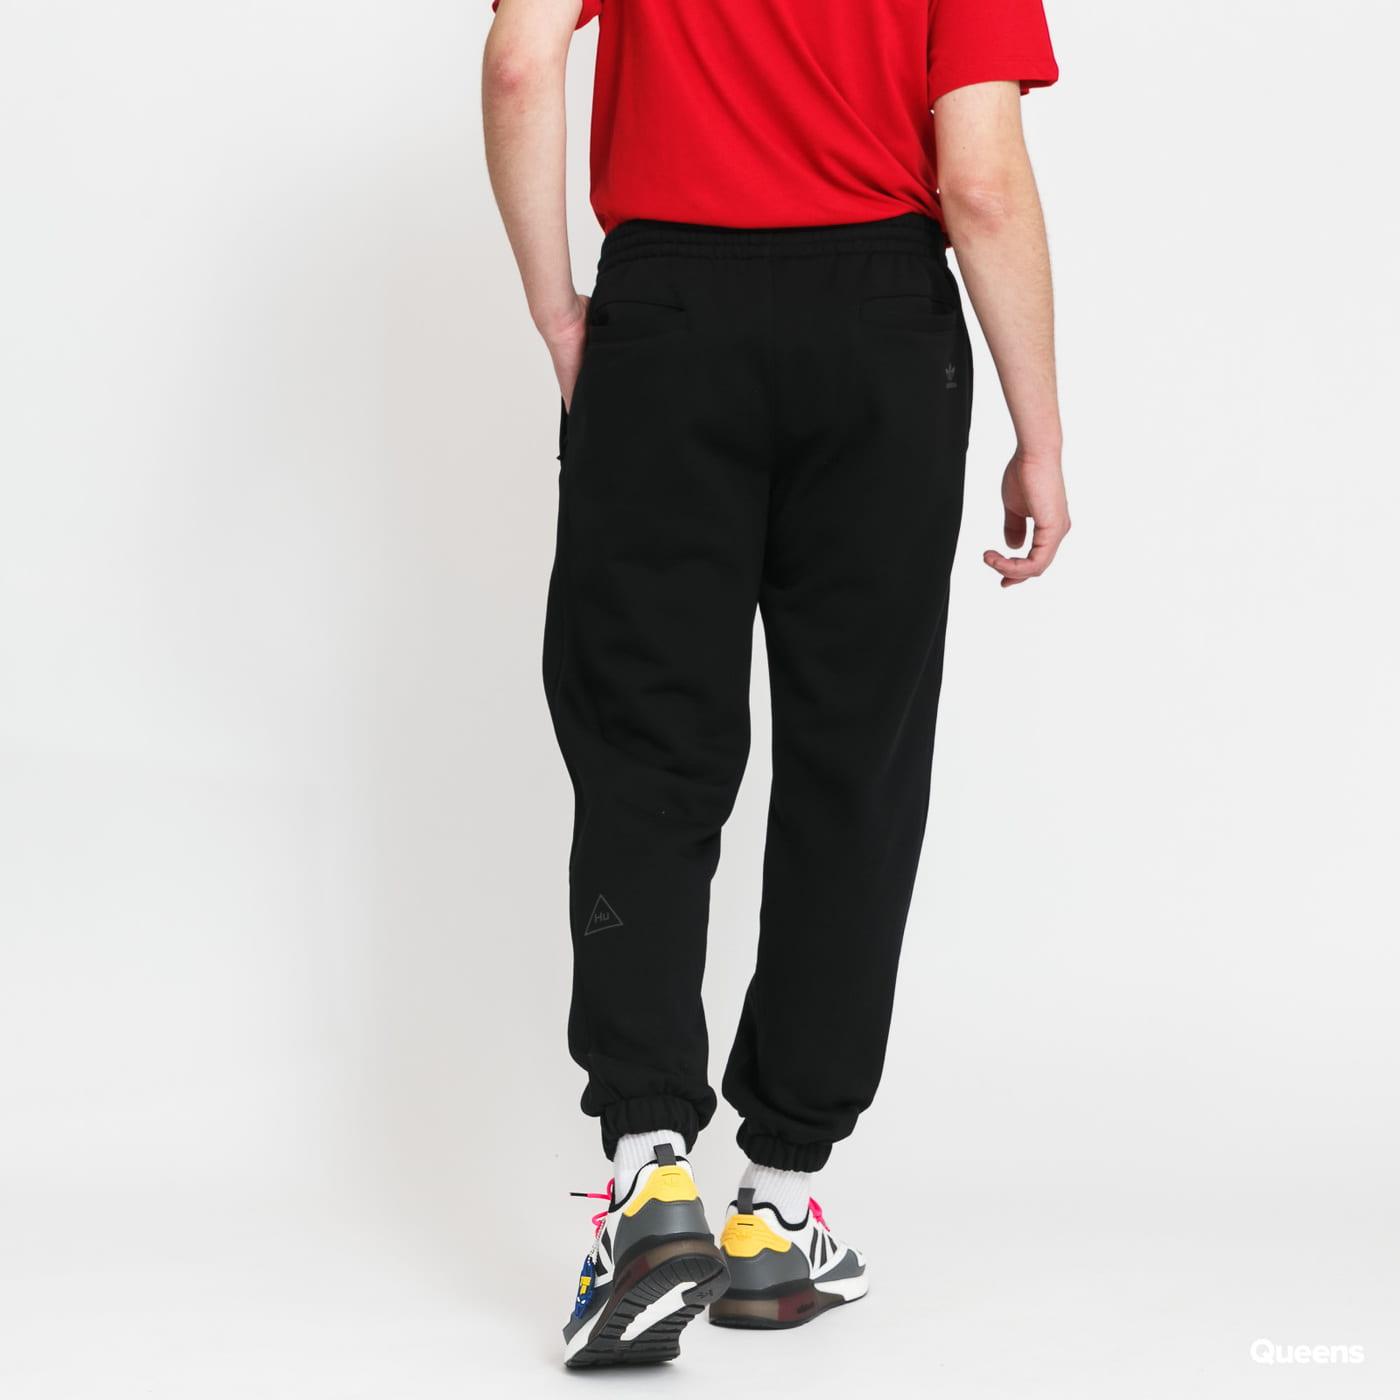 adidas Originals PW Bas Pant černé